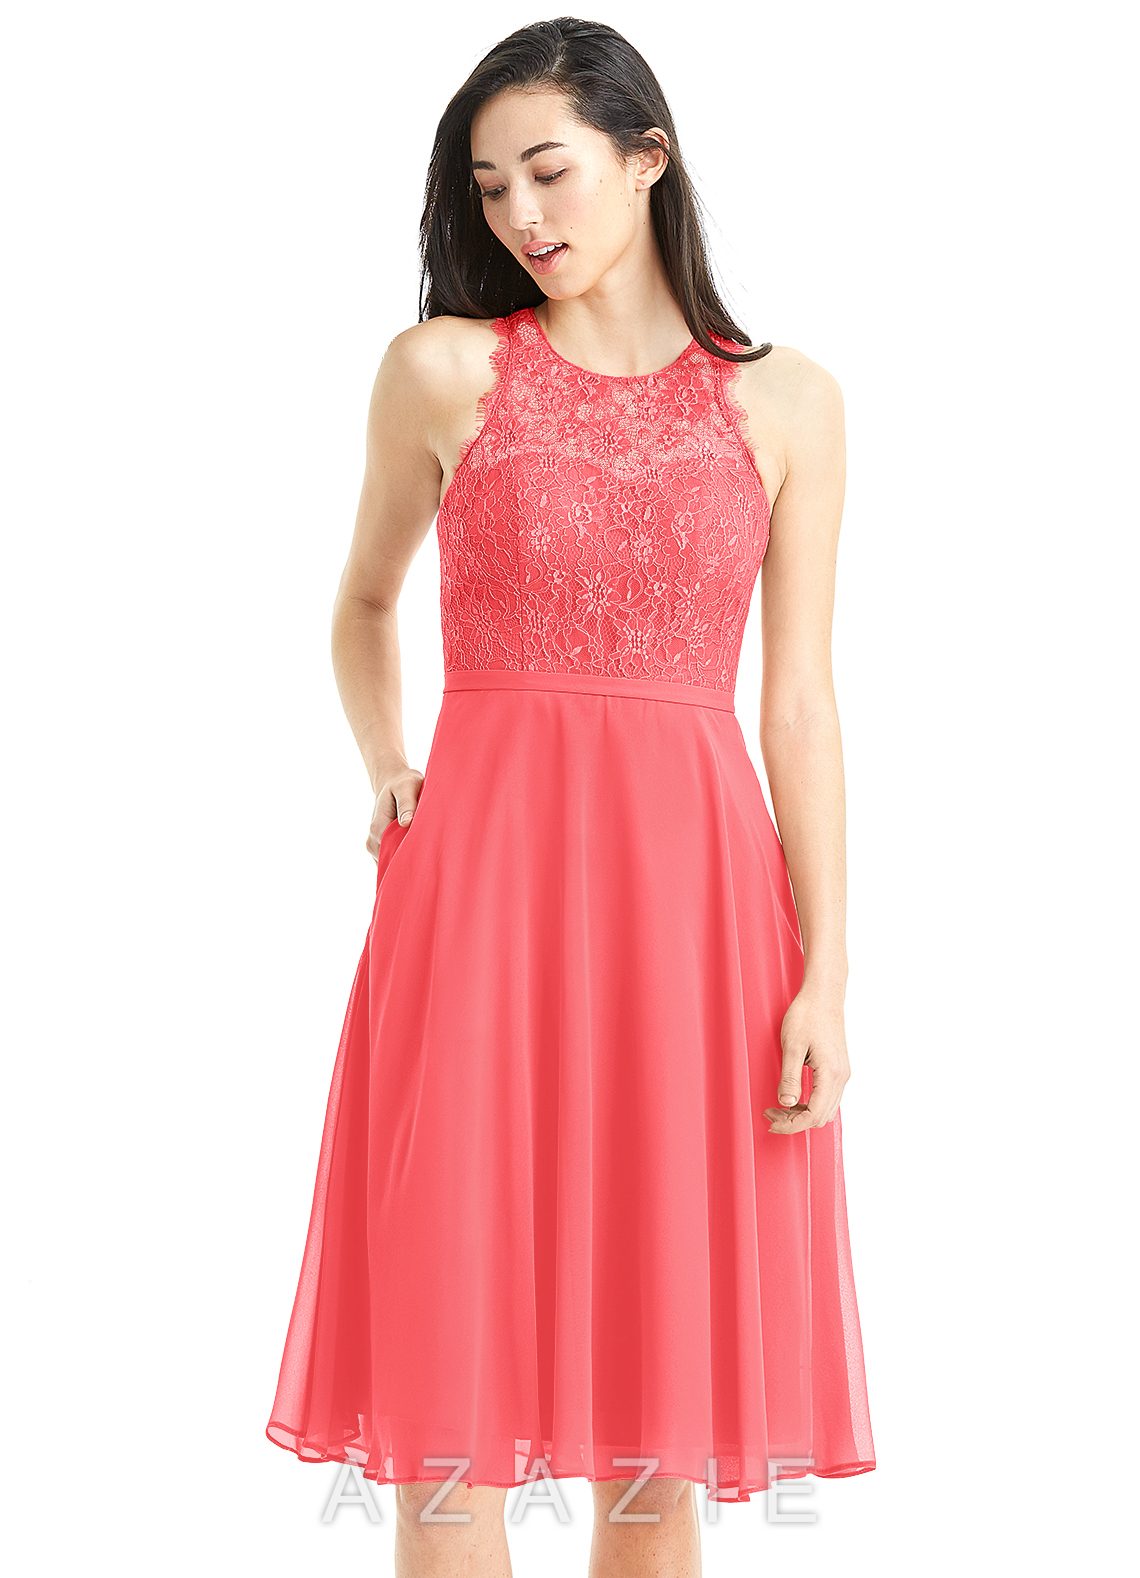 d27fb845014 Azazie Sylvia Bridesmaid Dress - Watermelon